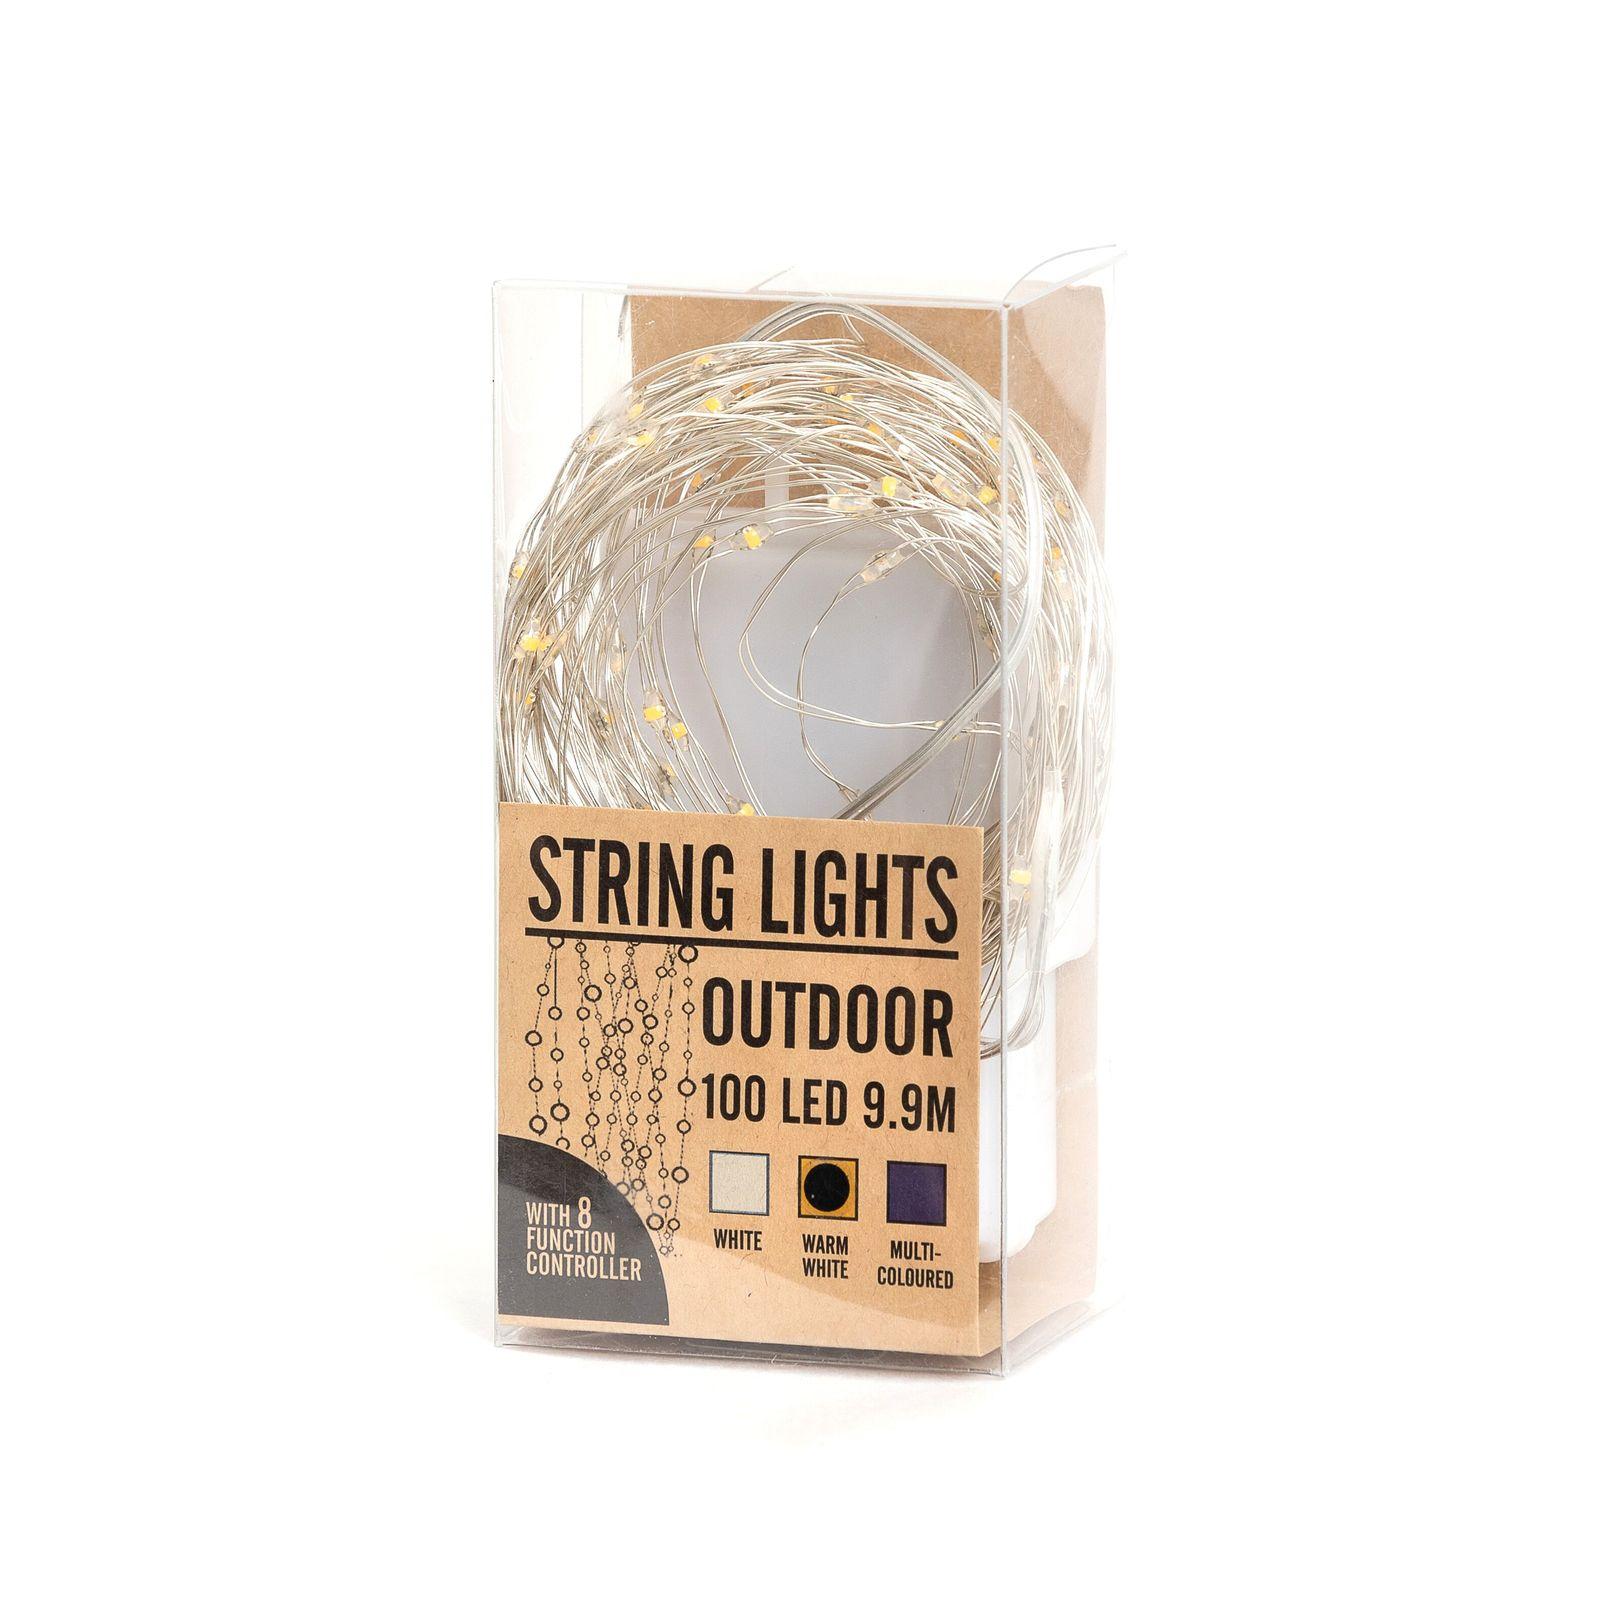 LED Outdoor String Lights - White (10m) image